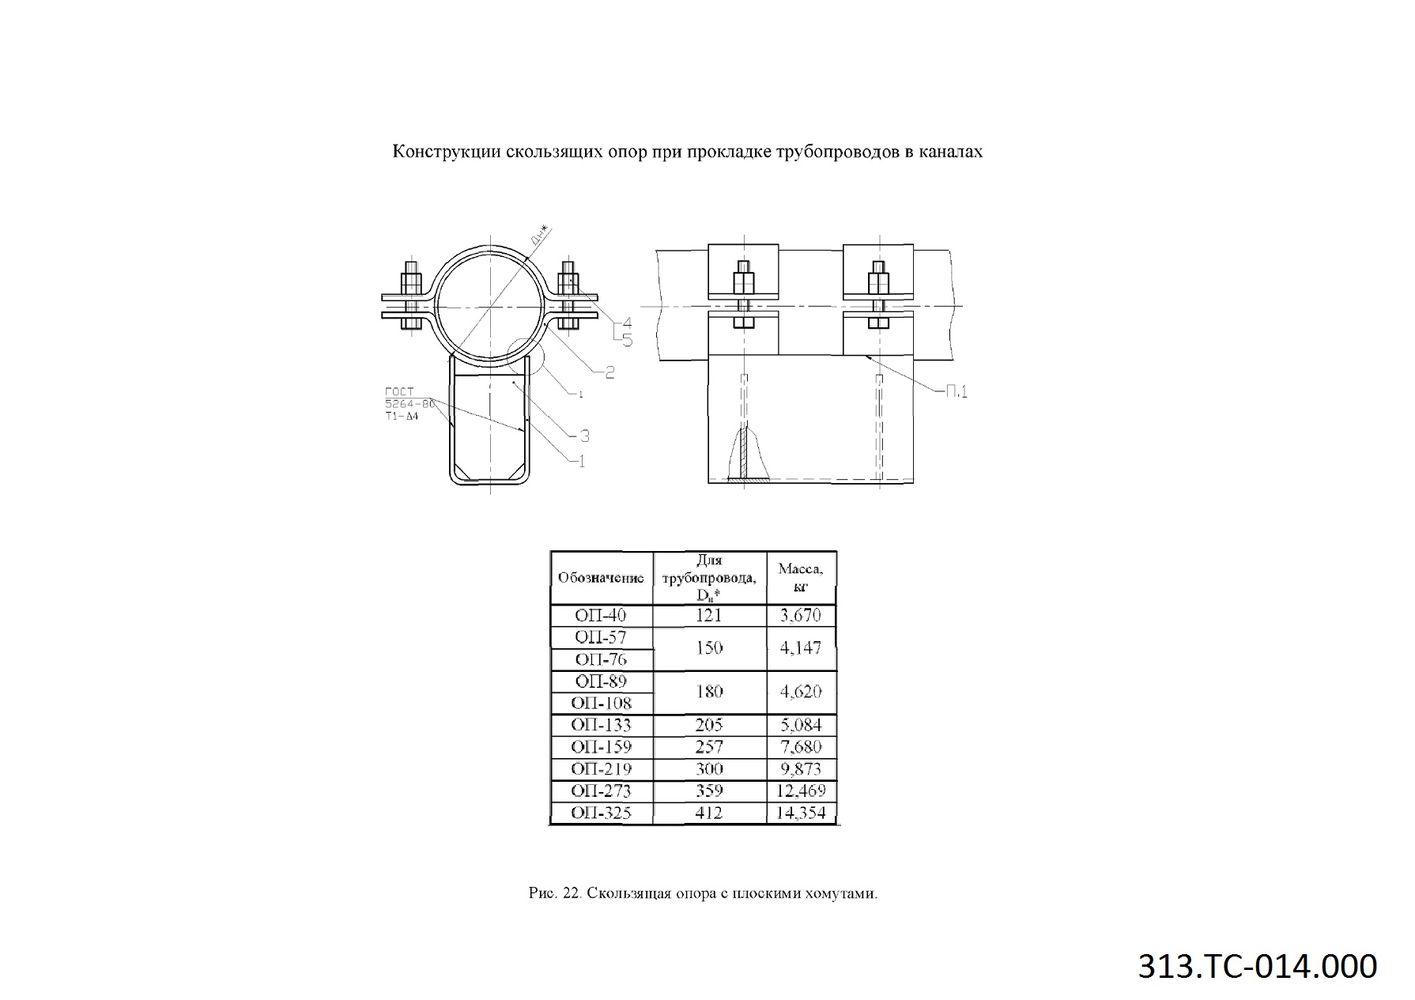 ТС.313-014-000 Скользящая опора с плоскими хомутами ОП